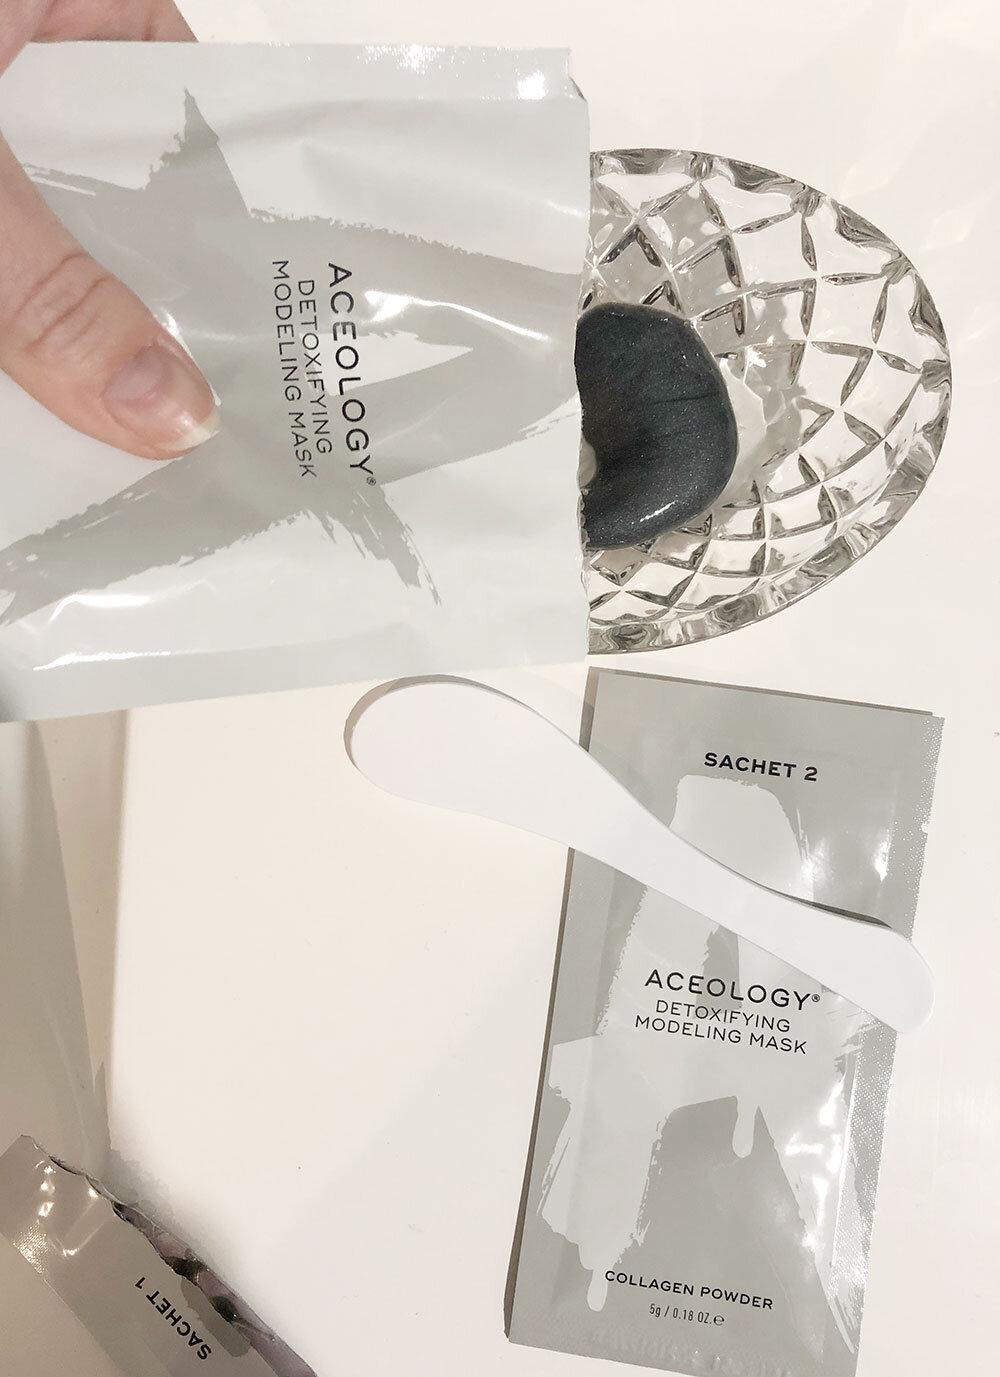 Aceology Detoxifying Modeling Mask Review - Step 1